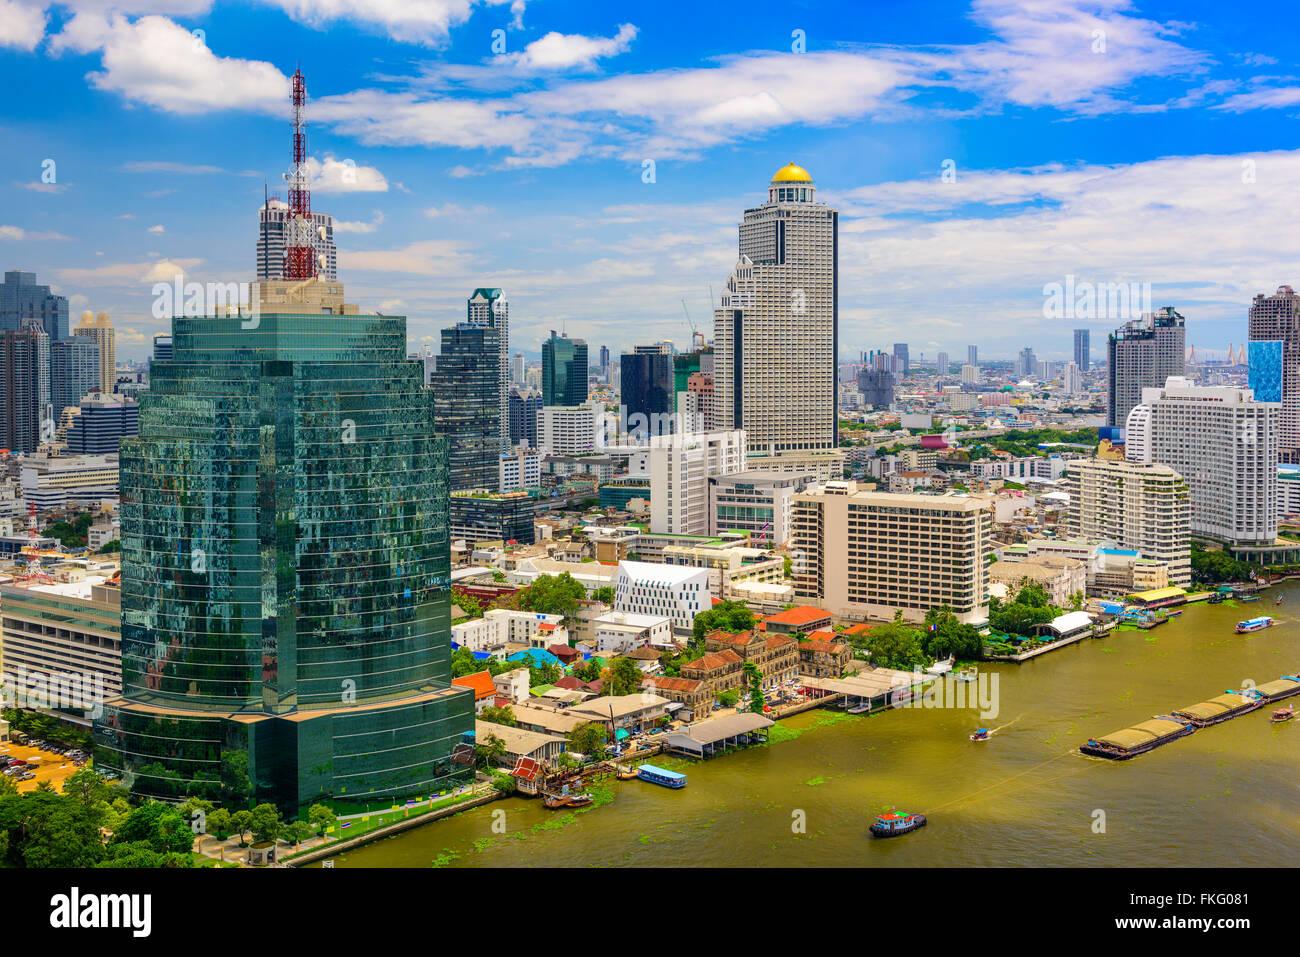 Bangkok, Thailand skyline on the Chaopraya River. - Stock Image